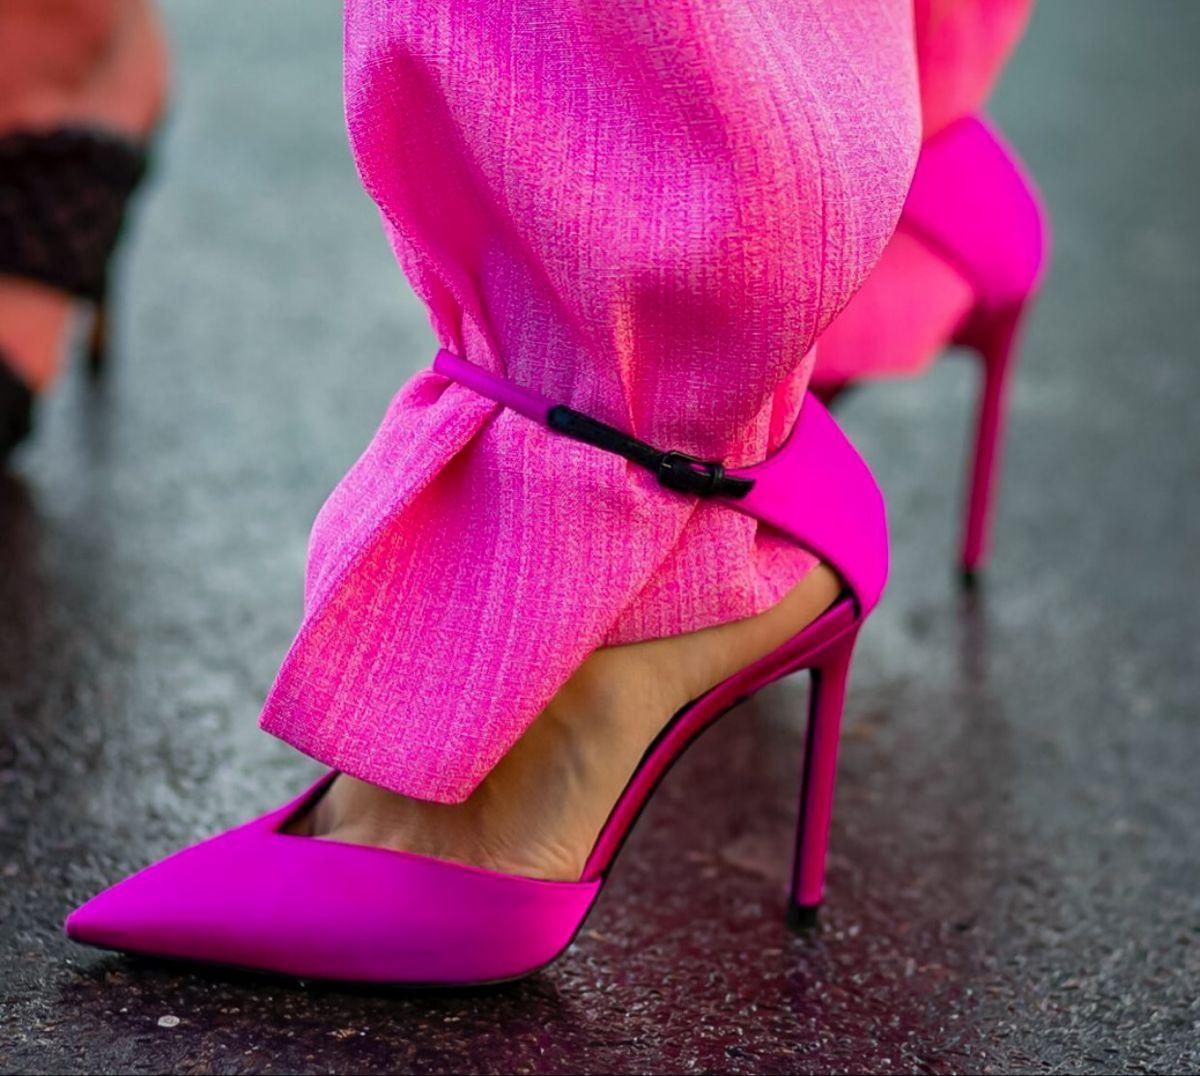 Shoes  #pink #heelsaddict #fashion #style #love #moda #model #photography #beautiful #beauty #instafashion #fashionista #instagram #cute #makeup #lifestyle #dress #design #handmade #girl